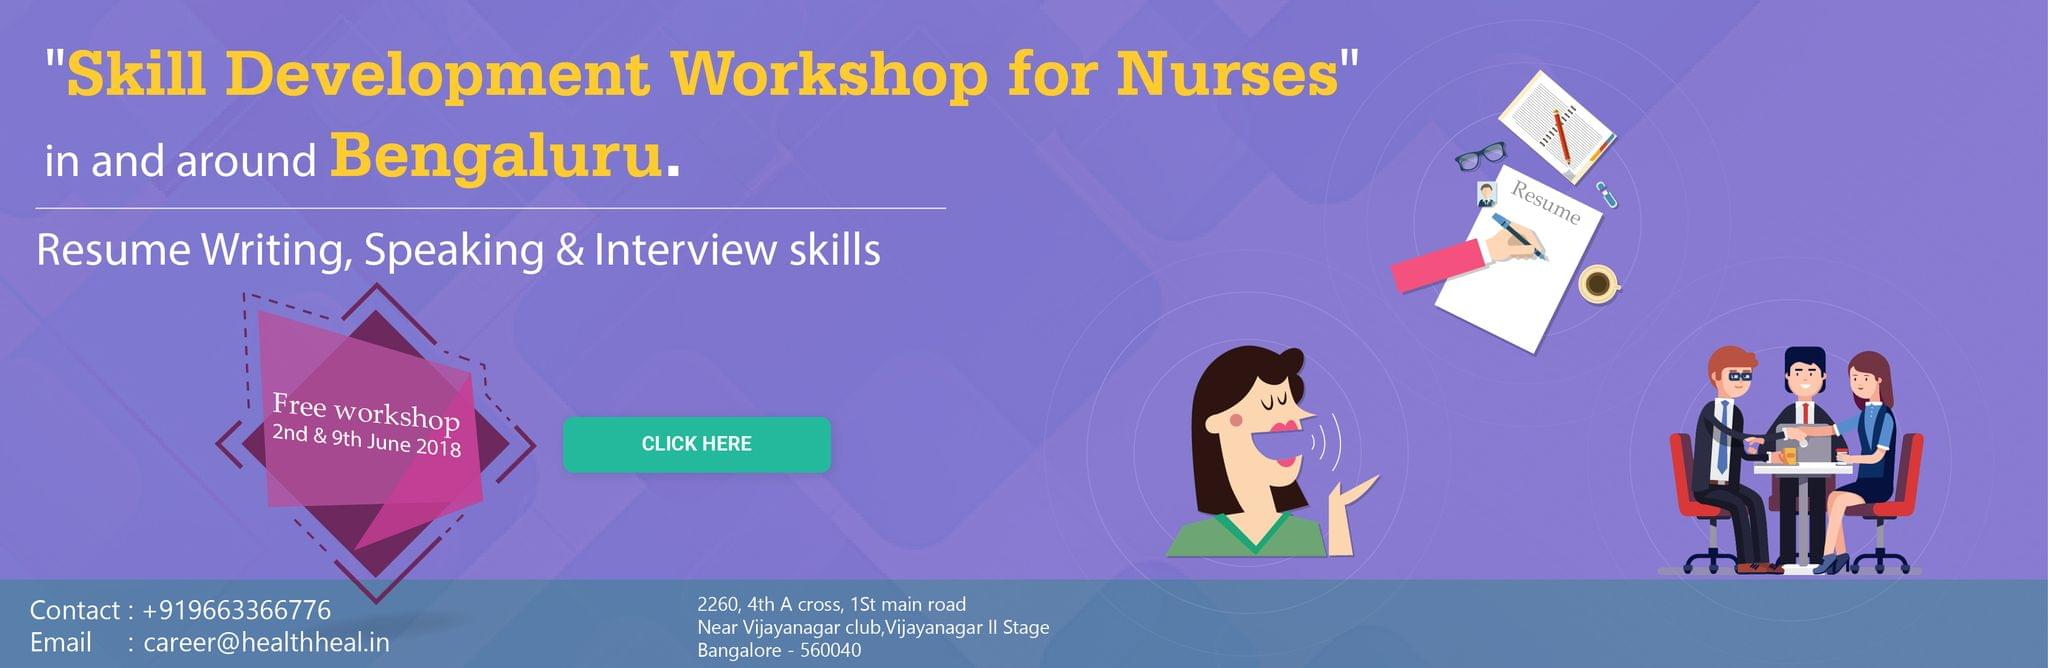 Skill Development Workshop for Nurses